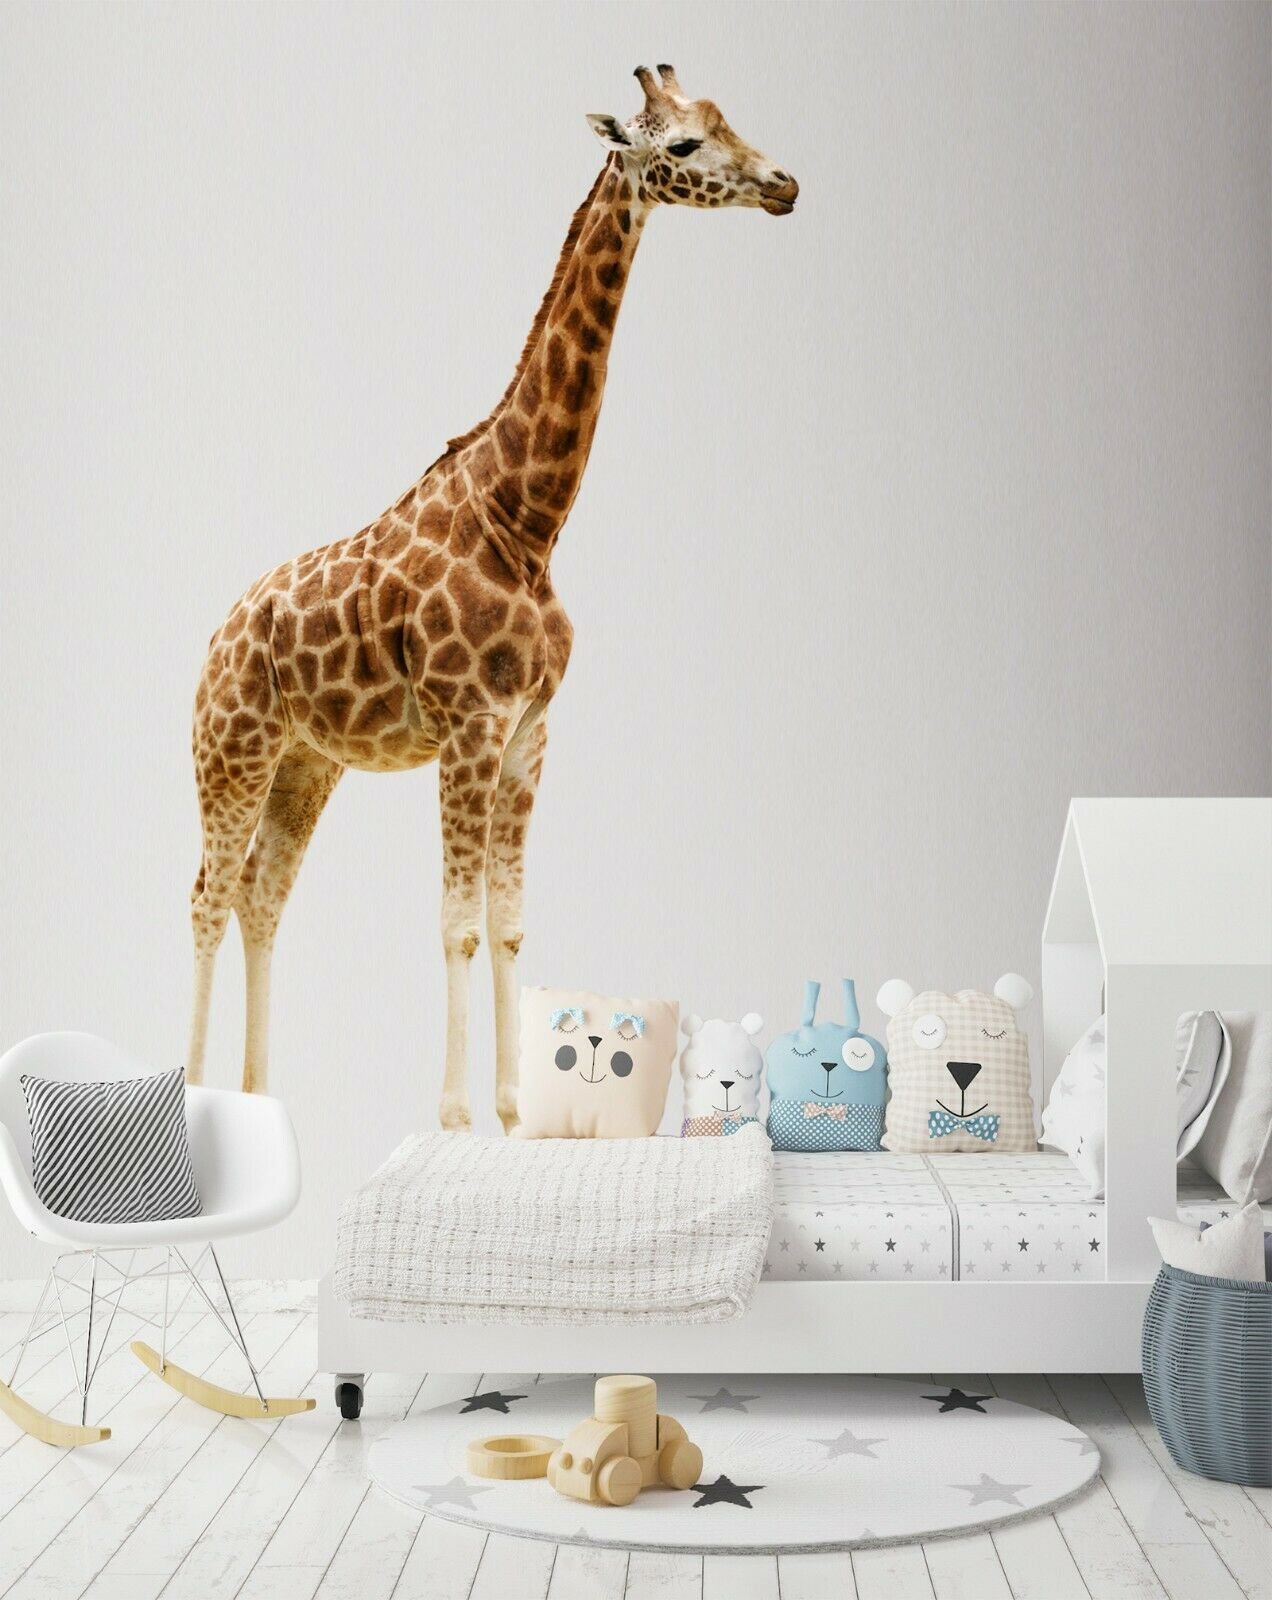 3D Handsome Giraffe B54 Animal Wallpaper Mural Poster Wall Stickers Decal Wendy